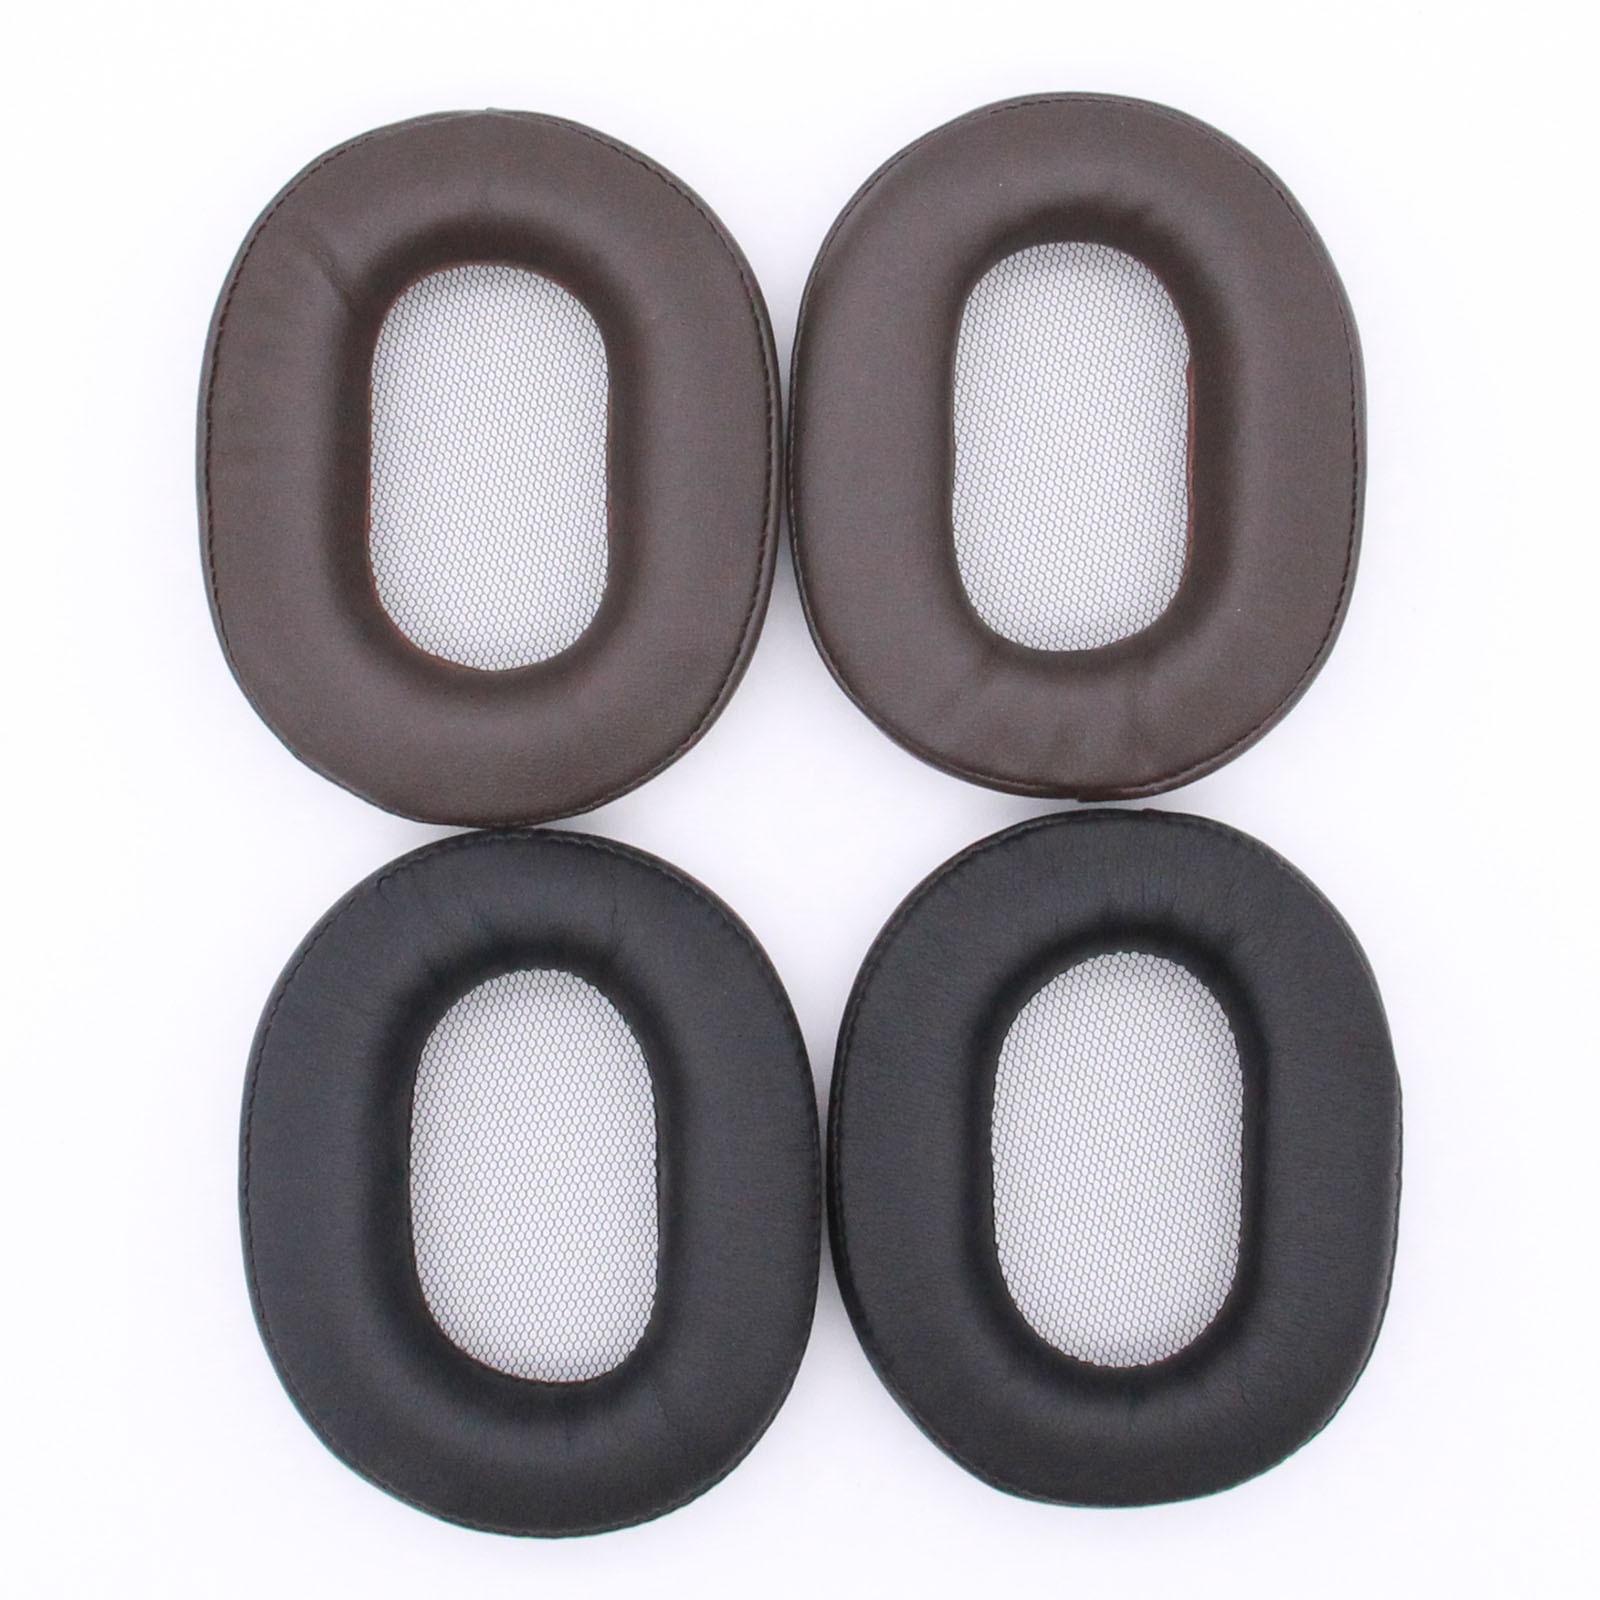 2 pieces Sony 1R MDR-1R/1RNC V6 7506 CD900ST Headphones Set Earmuffs Cotton Sponge Earphones